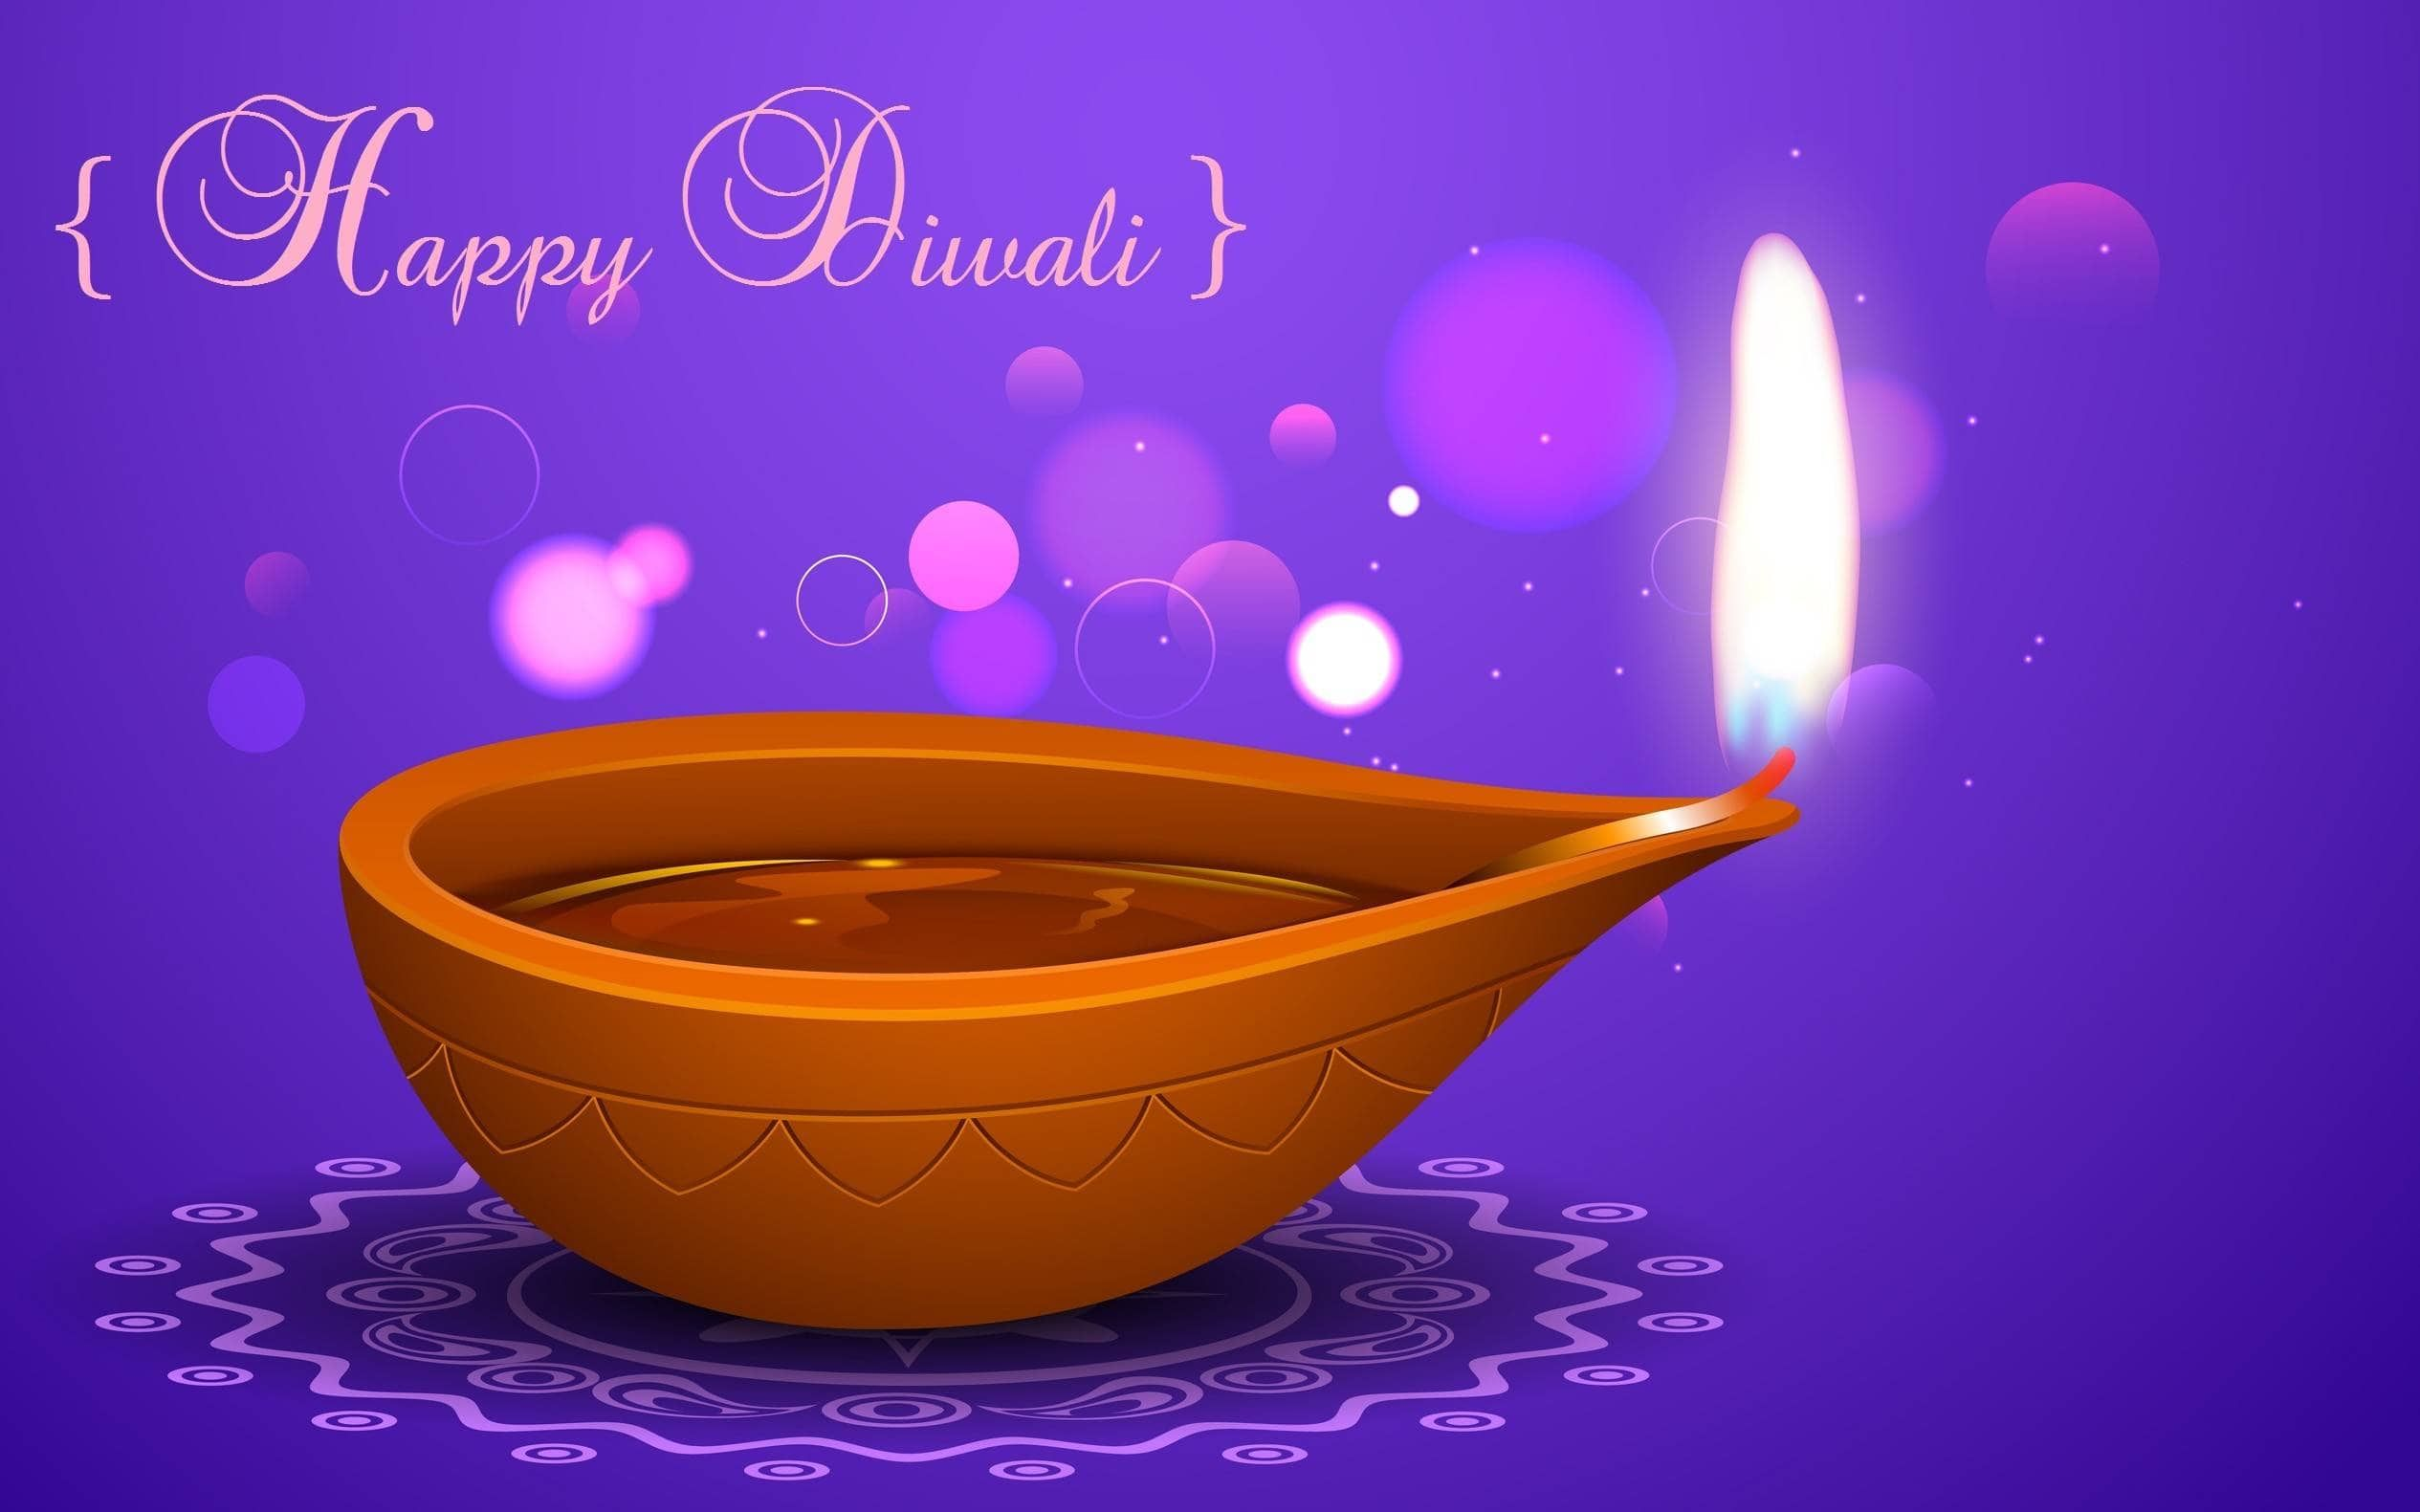 Diwali Wallpaper 2018 Download Free Latest Hd Diwali Wallpapers Happy Diwali Wallpapers Happy Diwali Happy Diwali Pictures